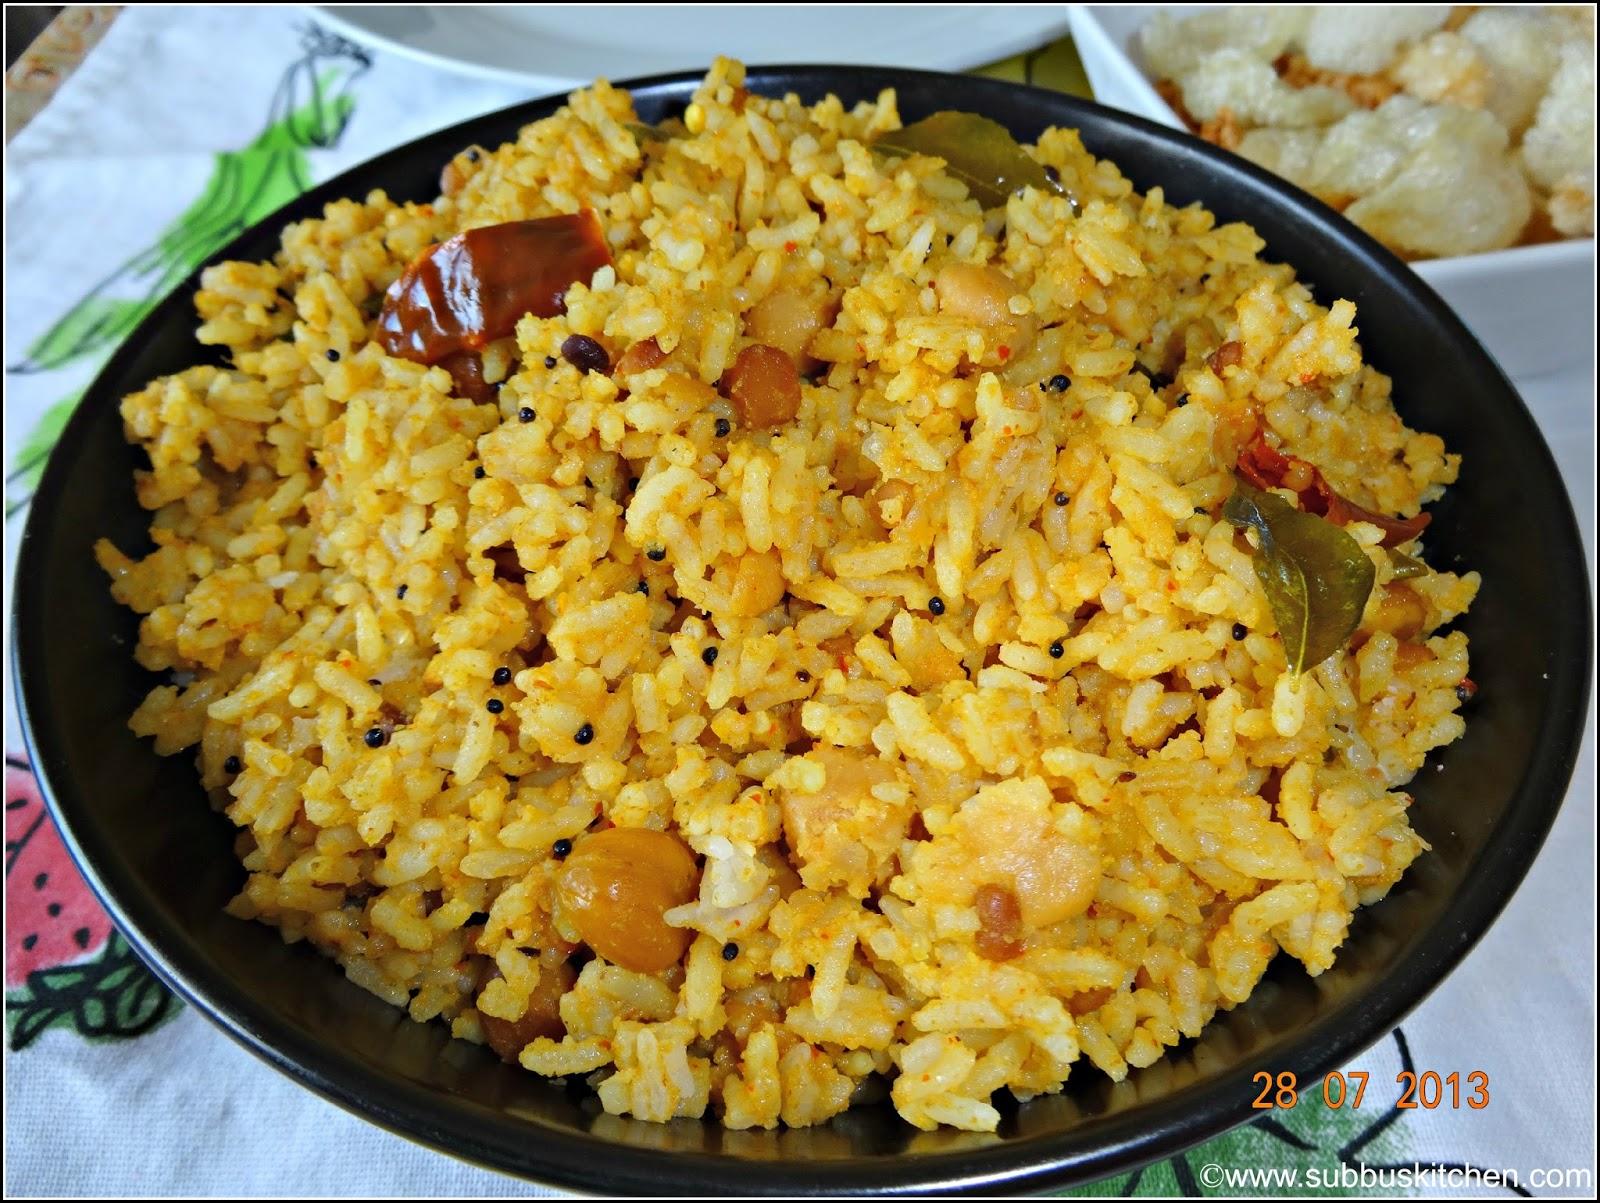 Pulikachal Recipe Subbus Kitchen